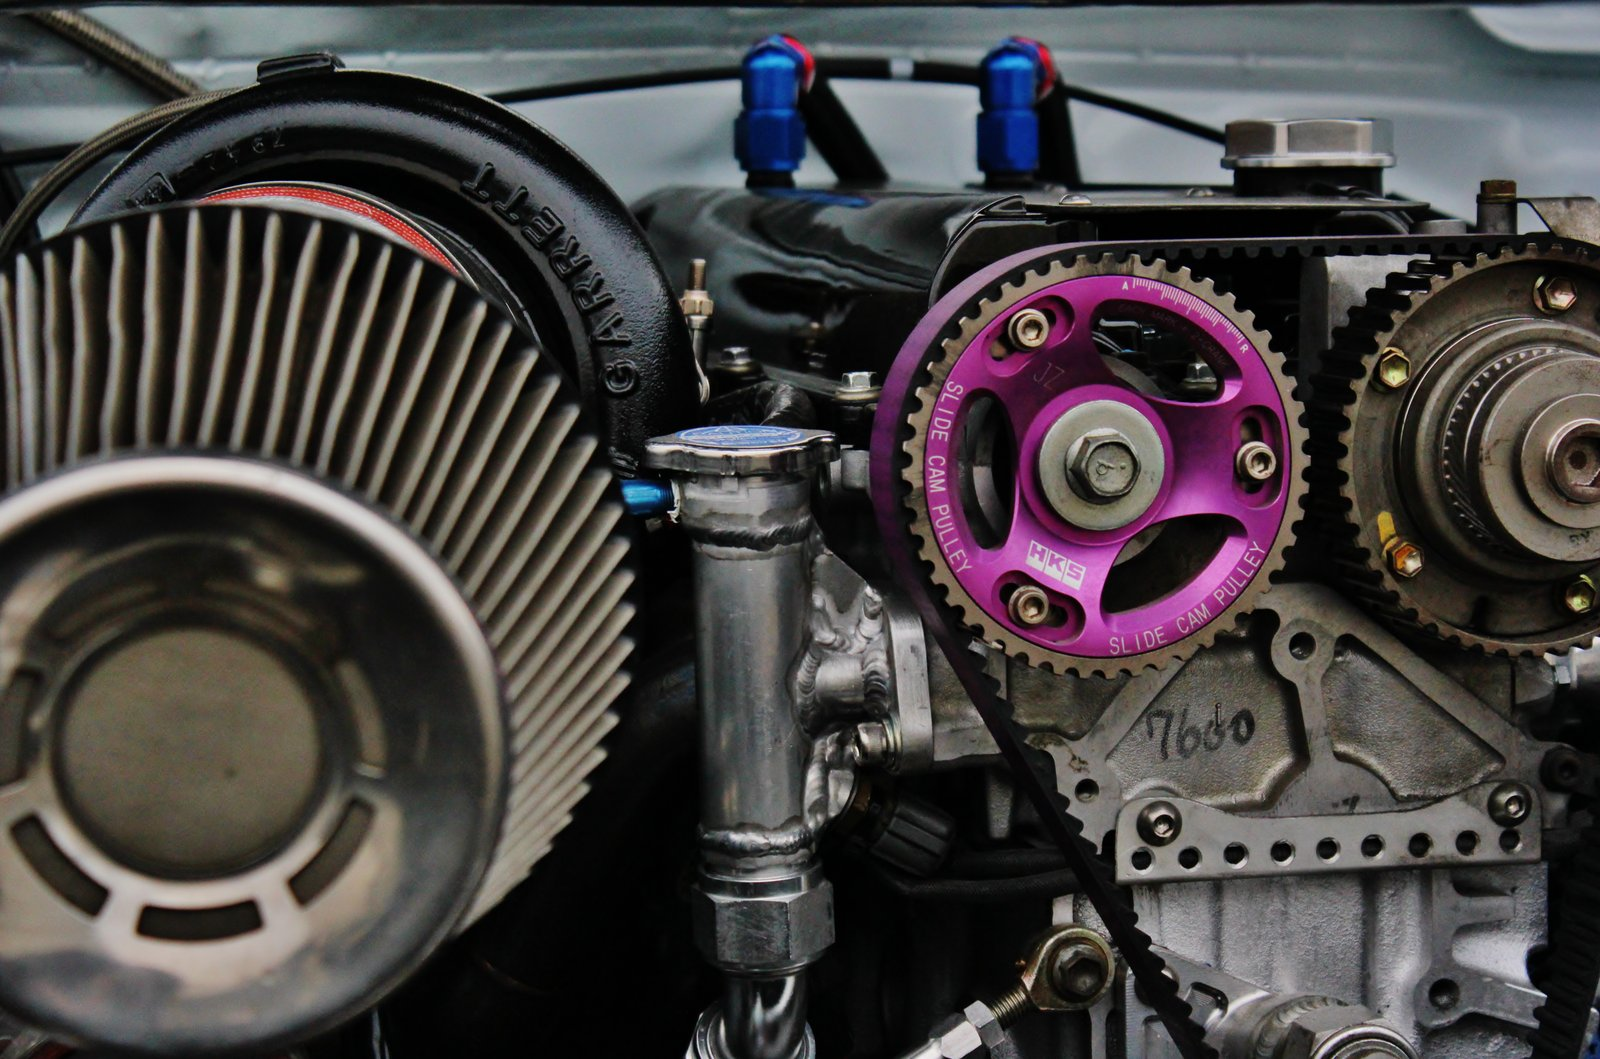 Best 49 Turbocharger Wallpaper on HipWallpaper Turbocharger 1600x1059